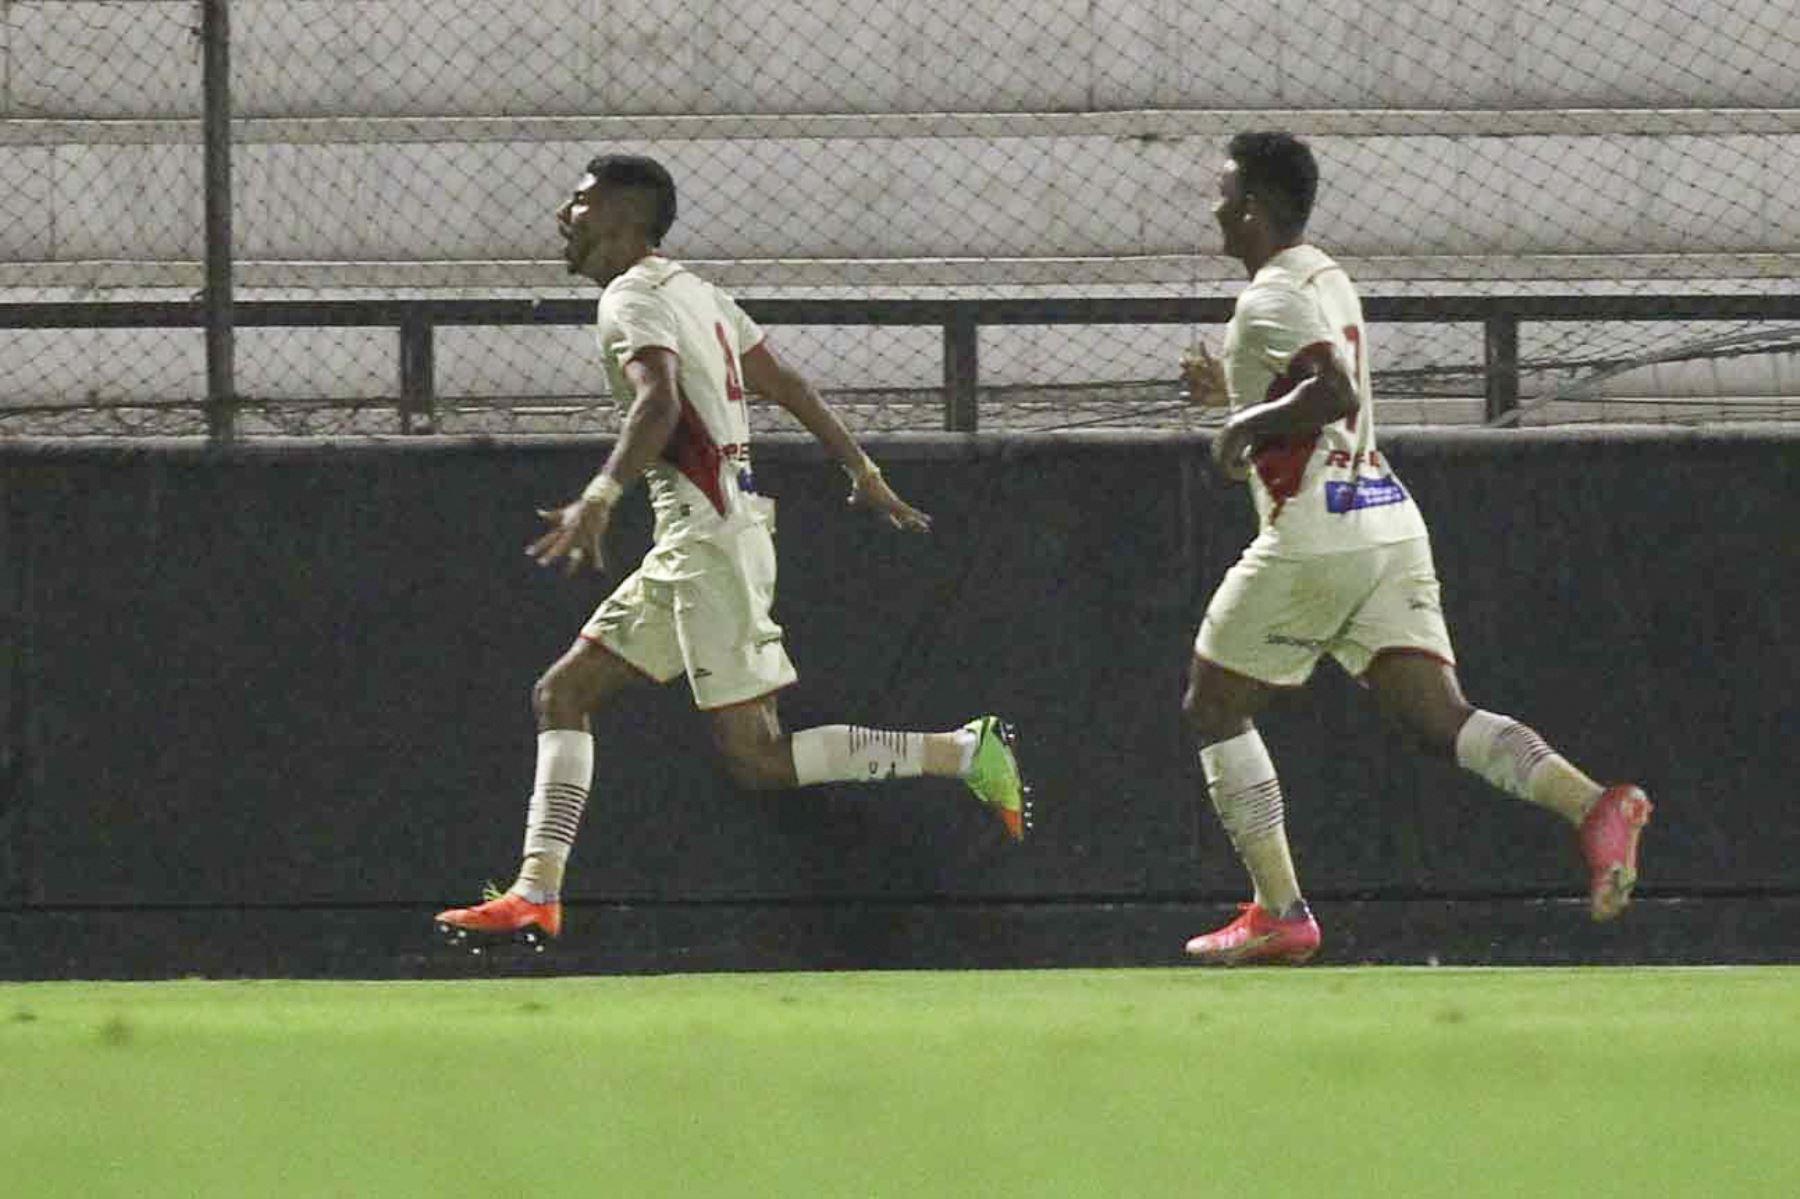 Gerardo Gordillo de UTC celebra tras anotar a Melgar  durante partido por la cuarta fecha de la Liga 1, en el estadio Iván Elias Moreno. Foto: Liga 1